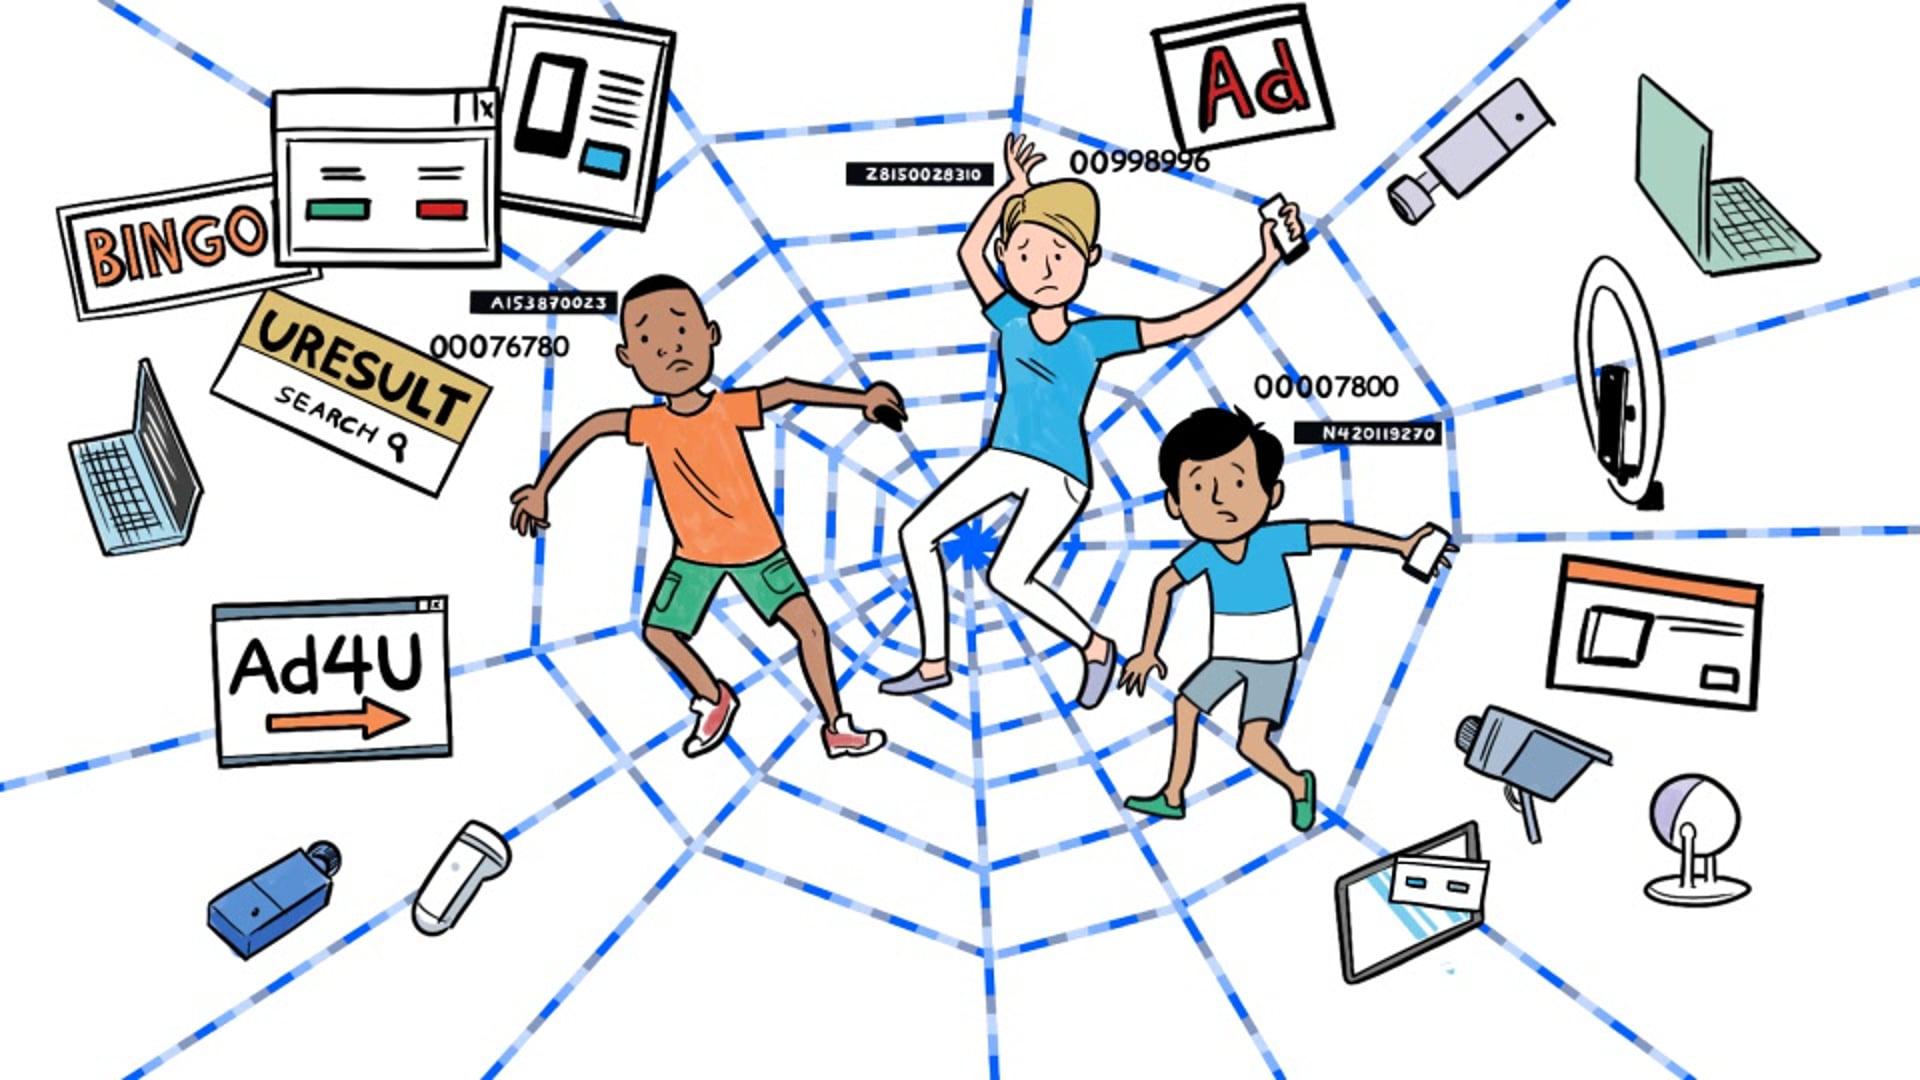 UNICEF | Data Manifesto: You can take action on children's data